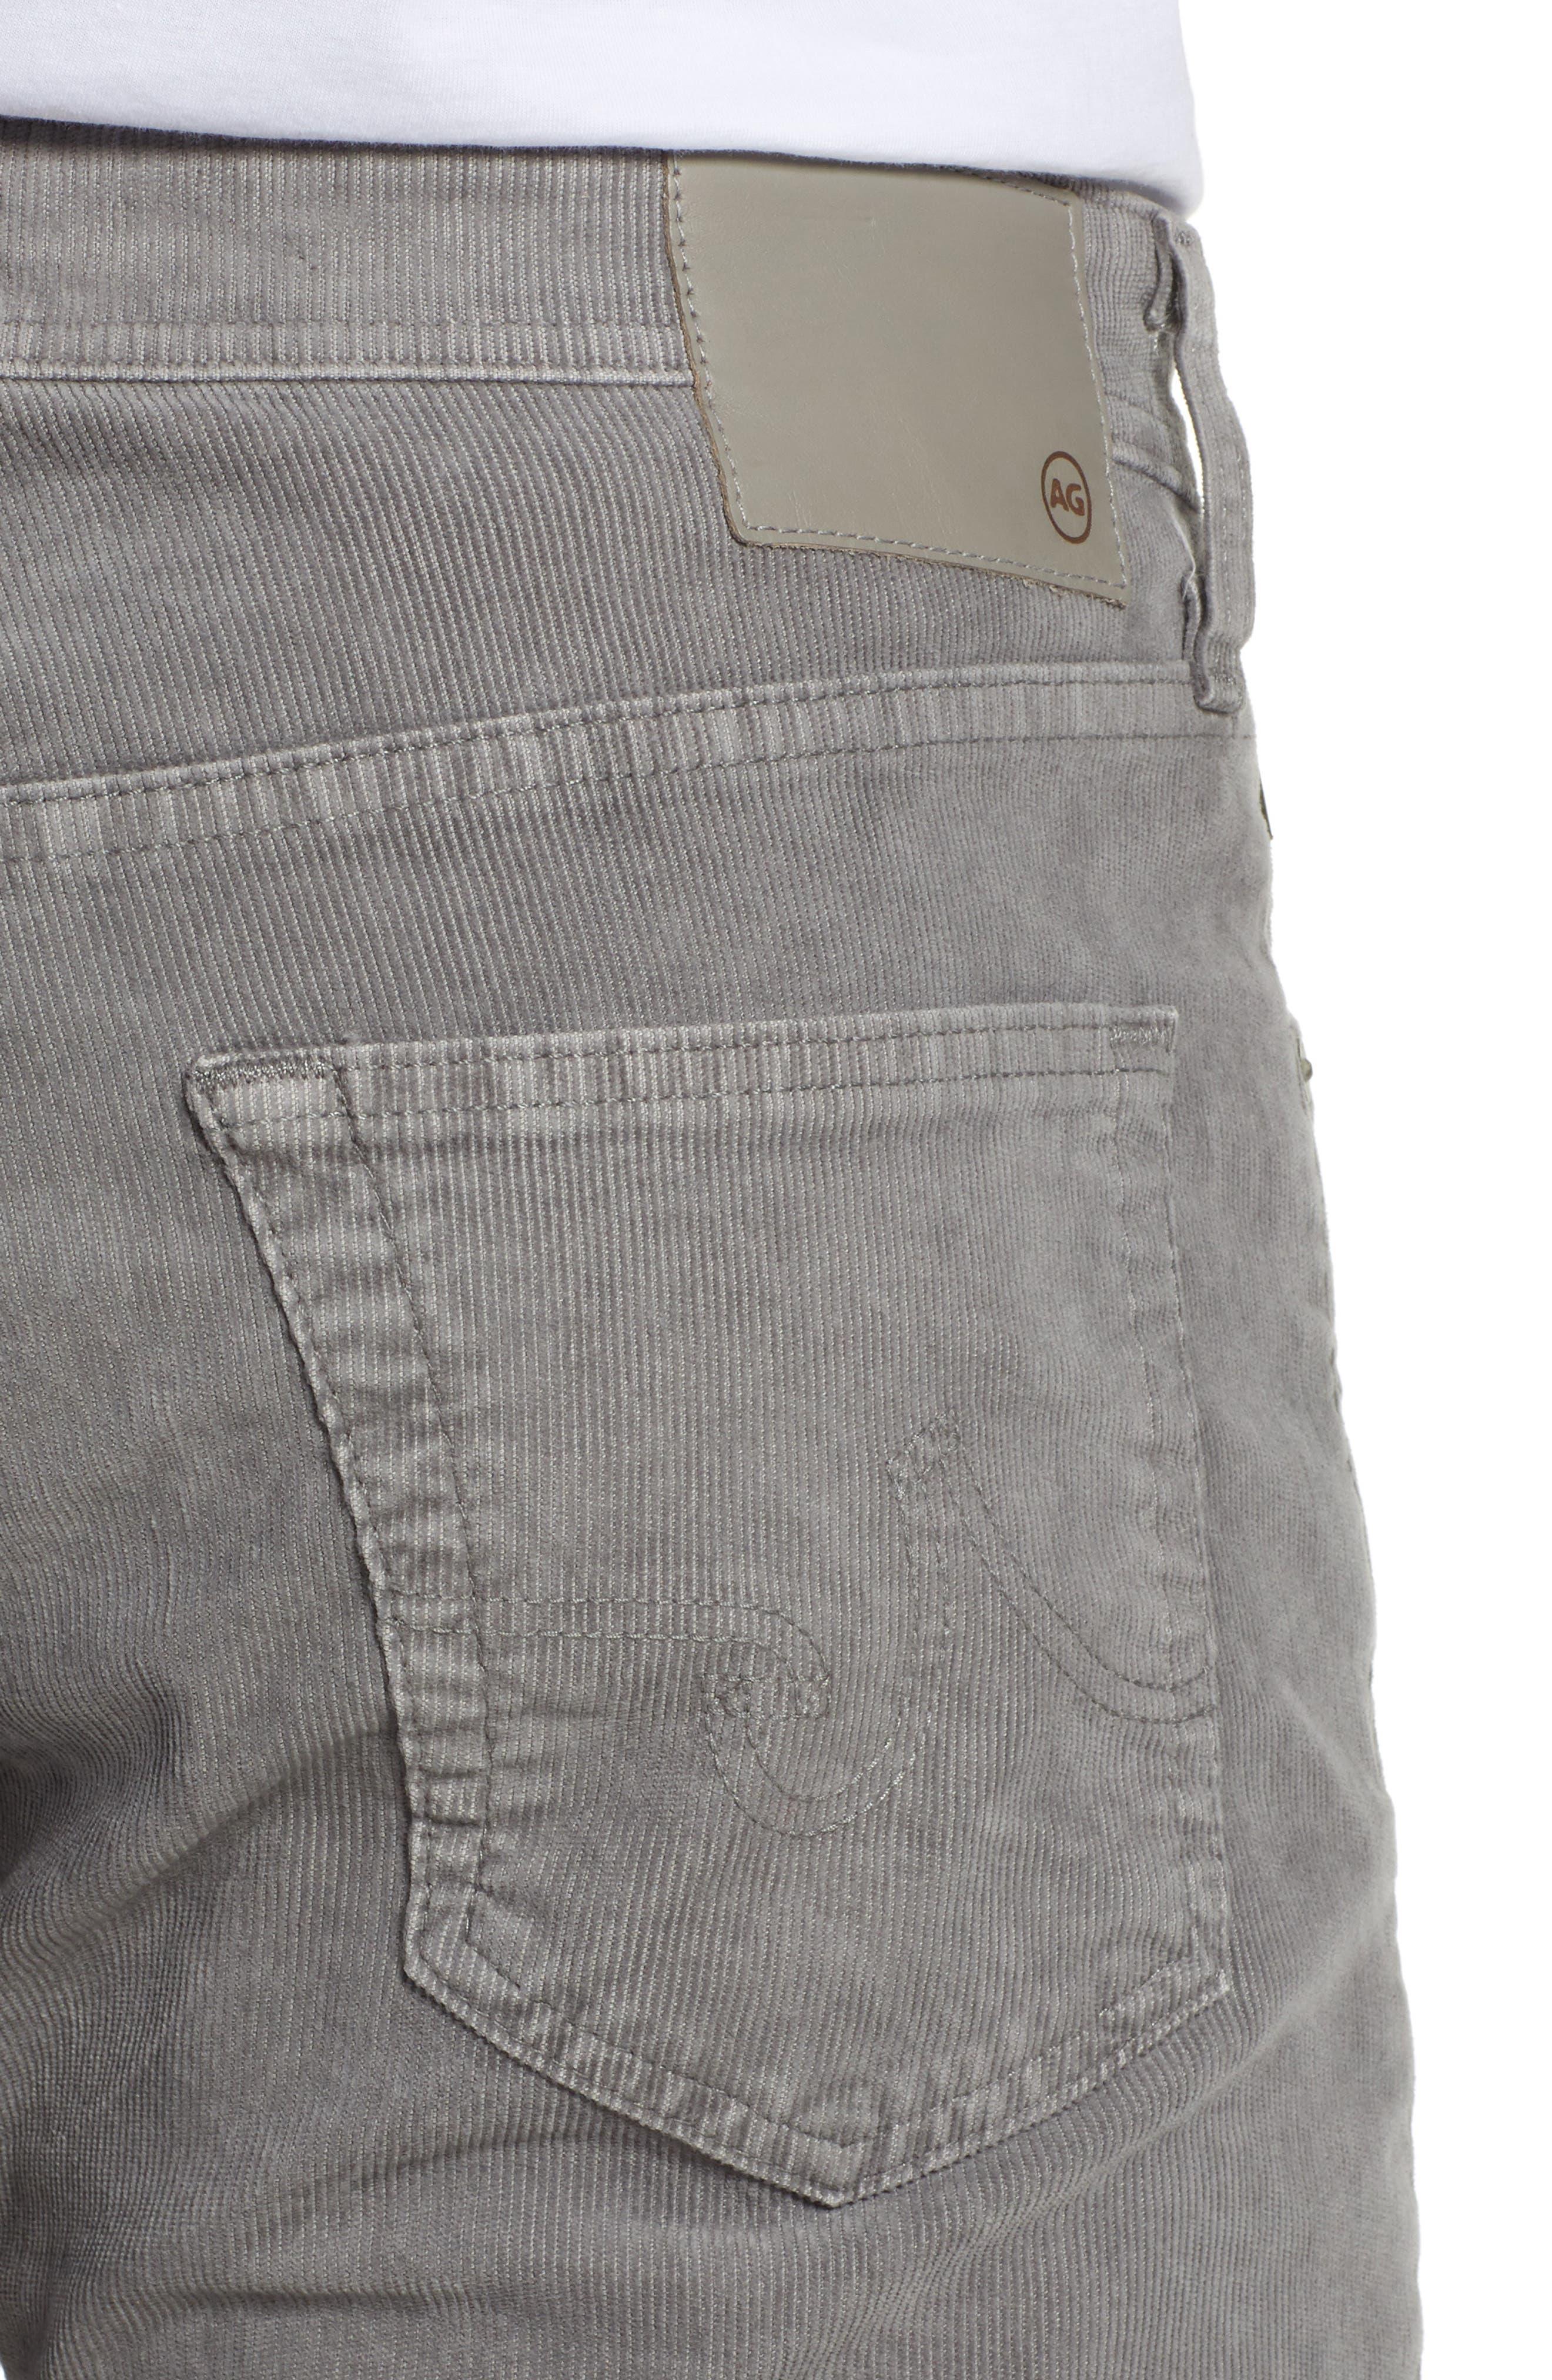 Everett Straight Leg Corduroy Pants,                             Alternate thumbnail 4, color,                             SULFUR AUTUMN FOG